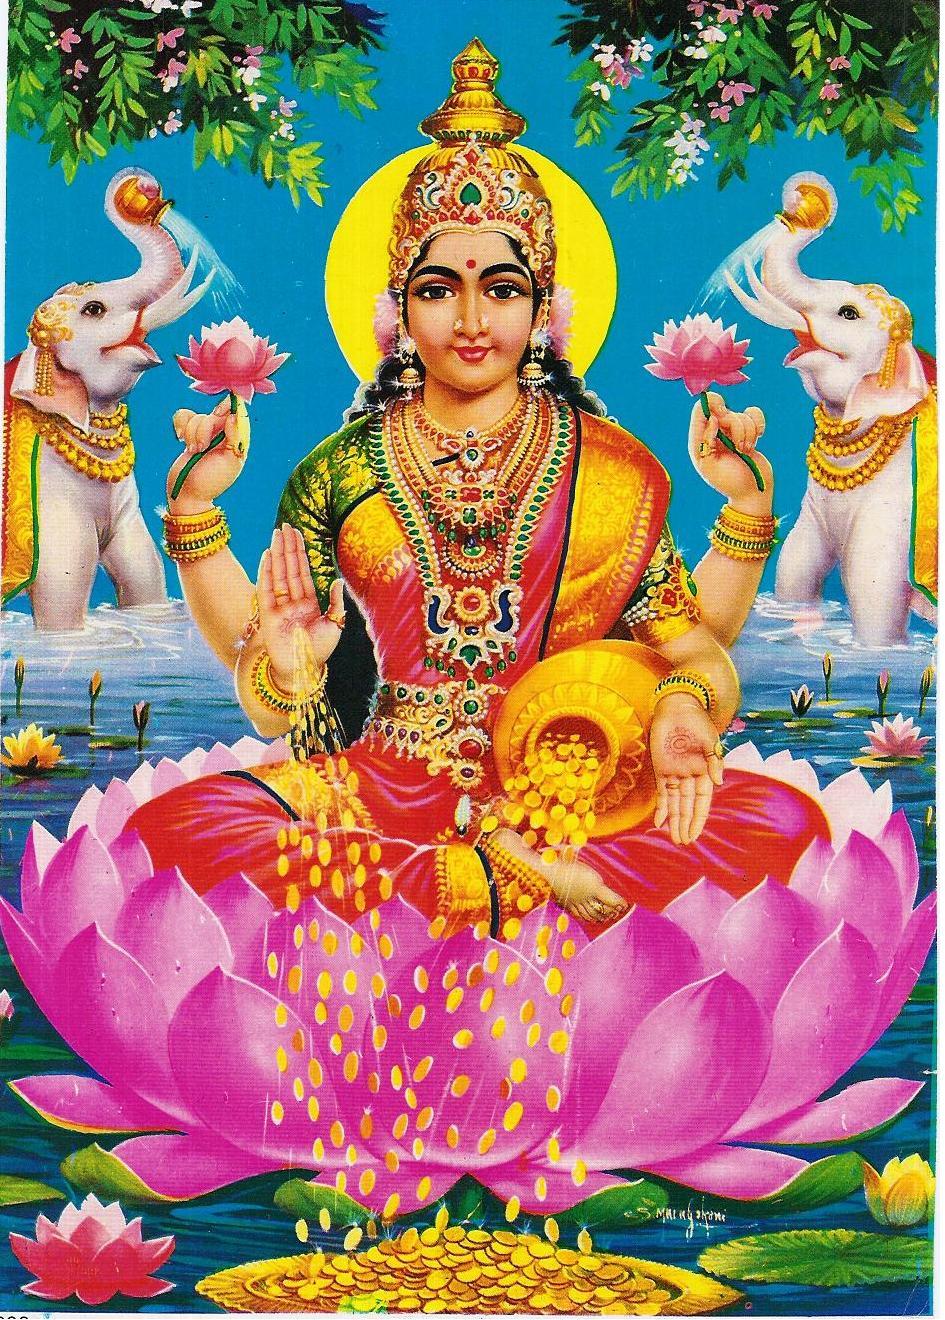 Little specials godinnen orakelkaarten doreen virtue - Images of hindu gods and goddesses ...